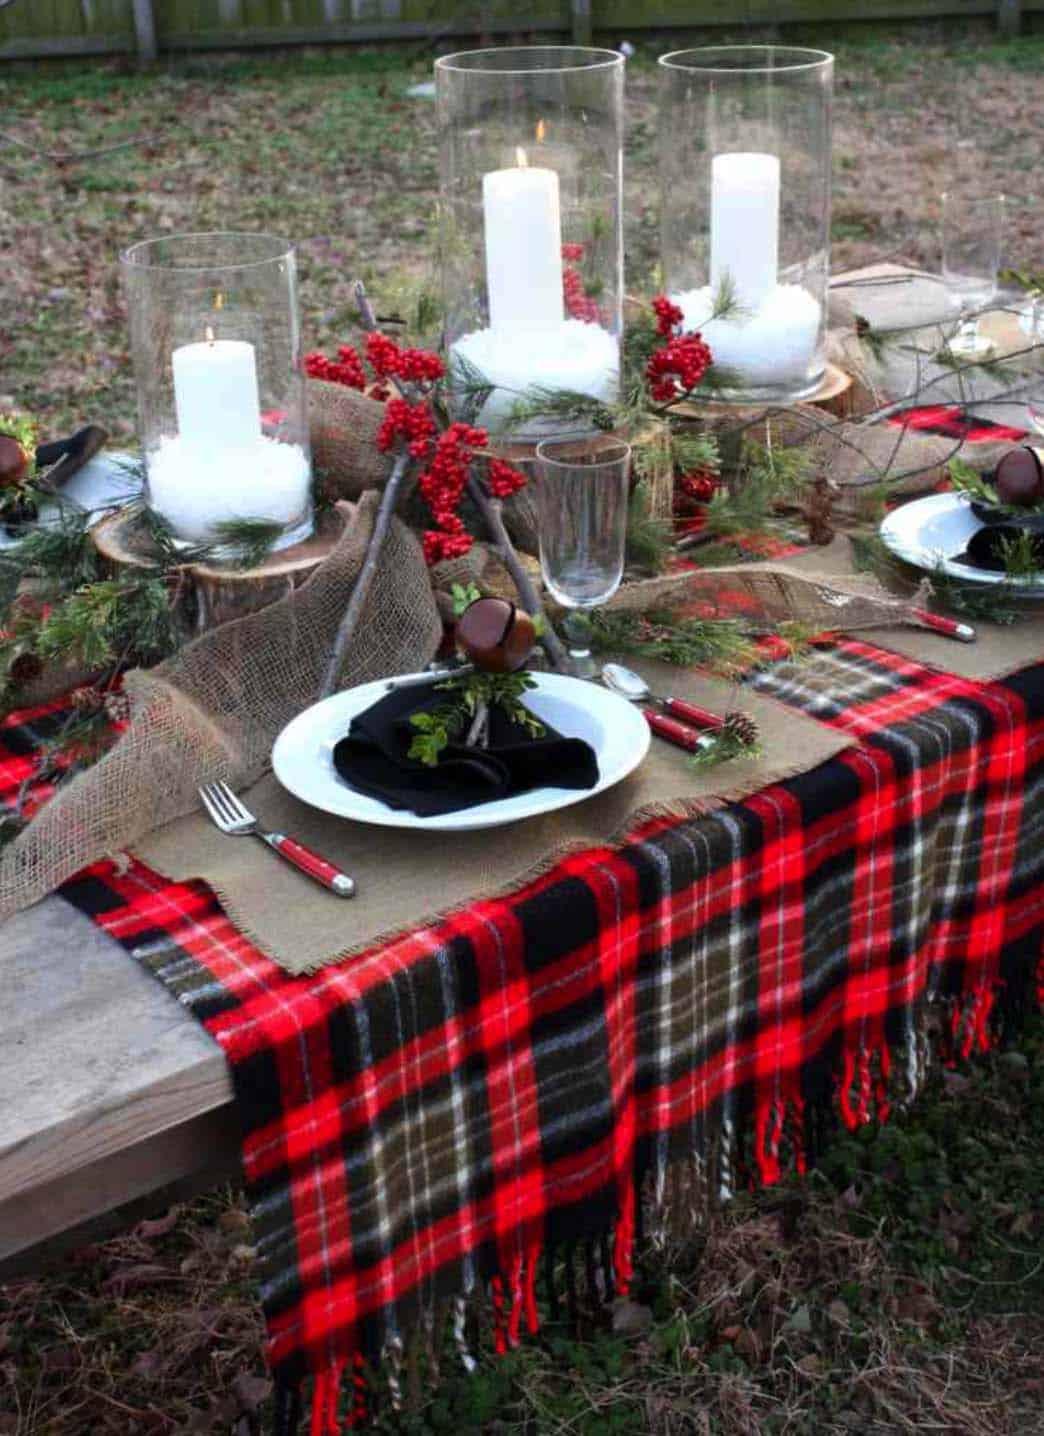 Inspiring Dining Table Christmas Decor Ideas-22-1 Kindesign